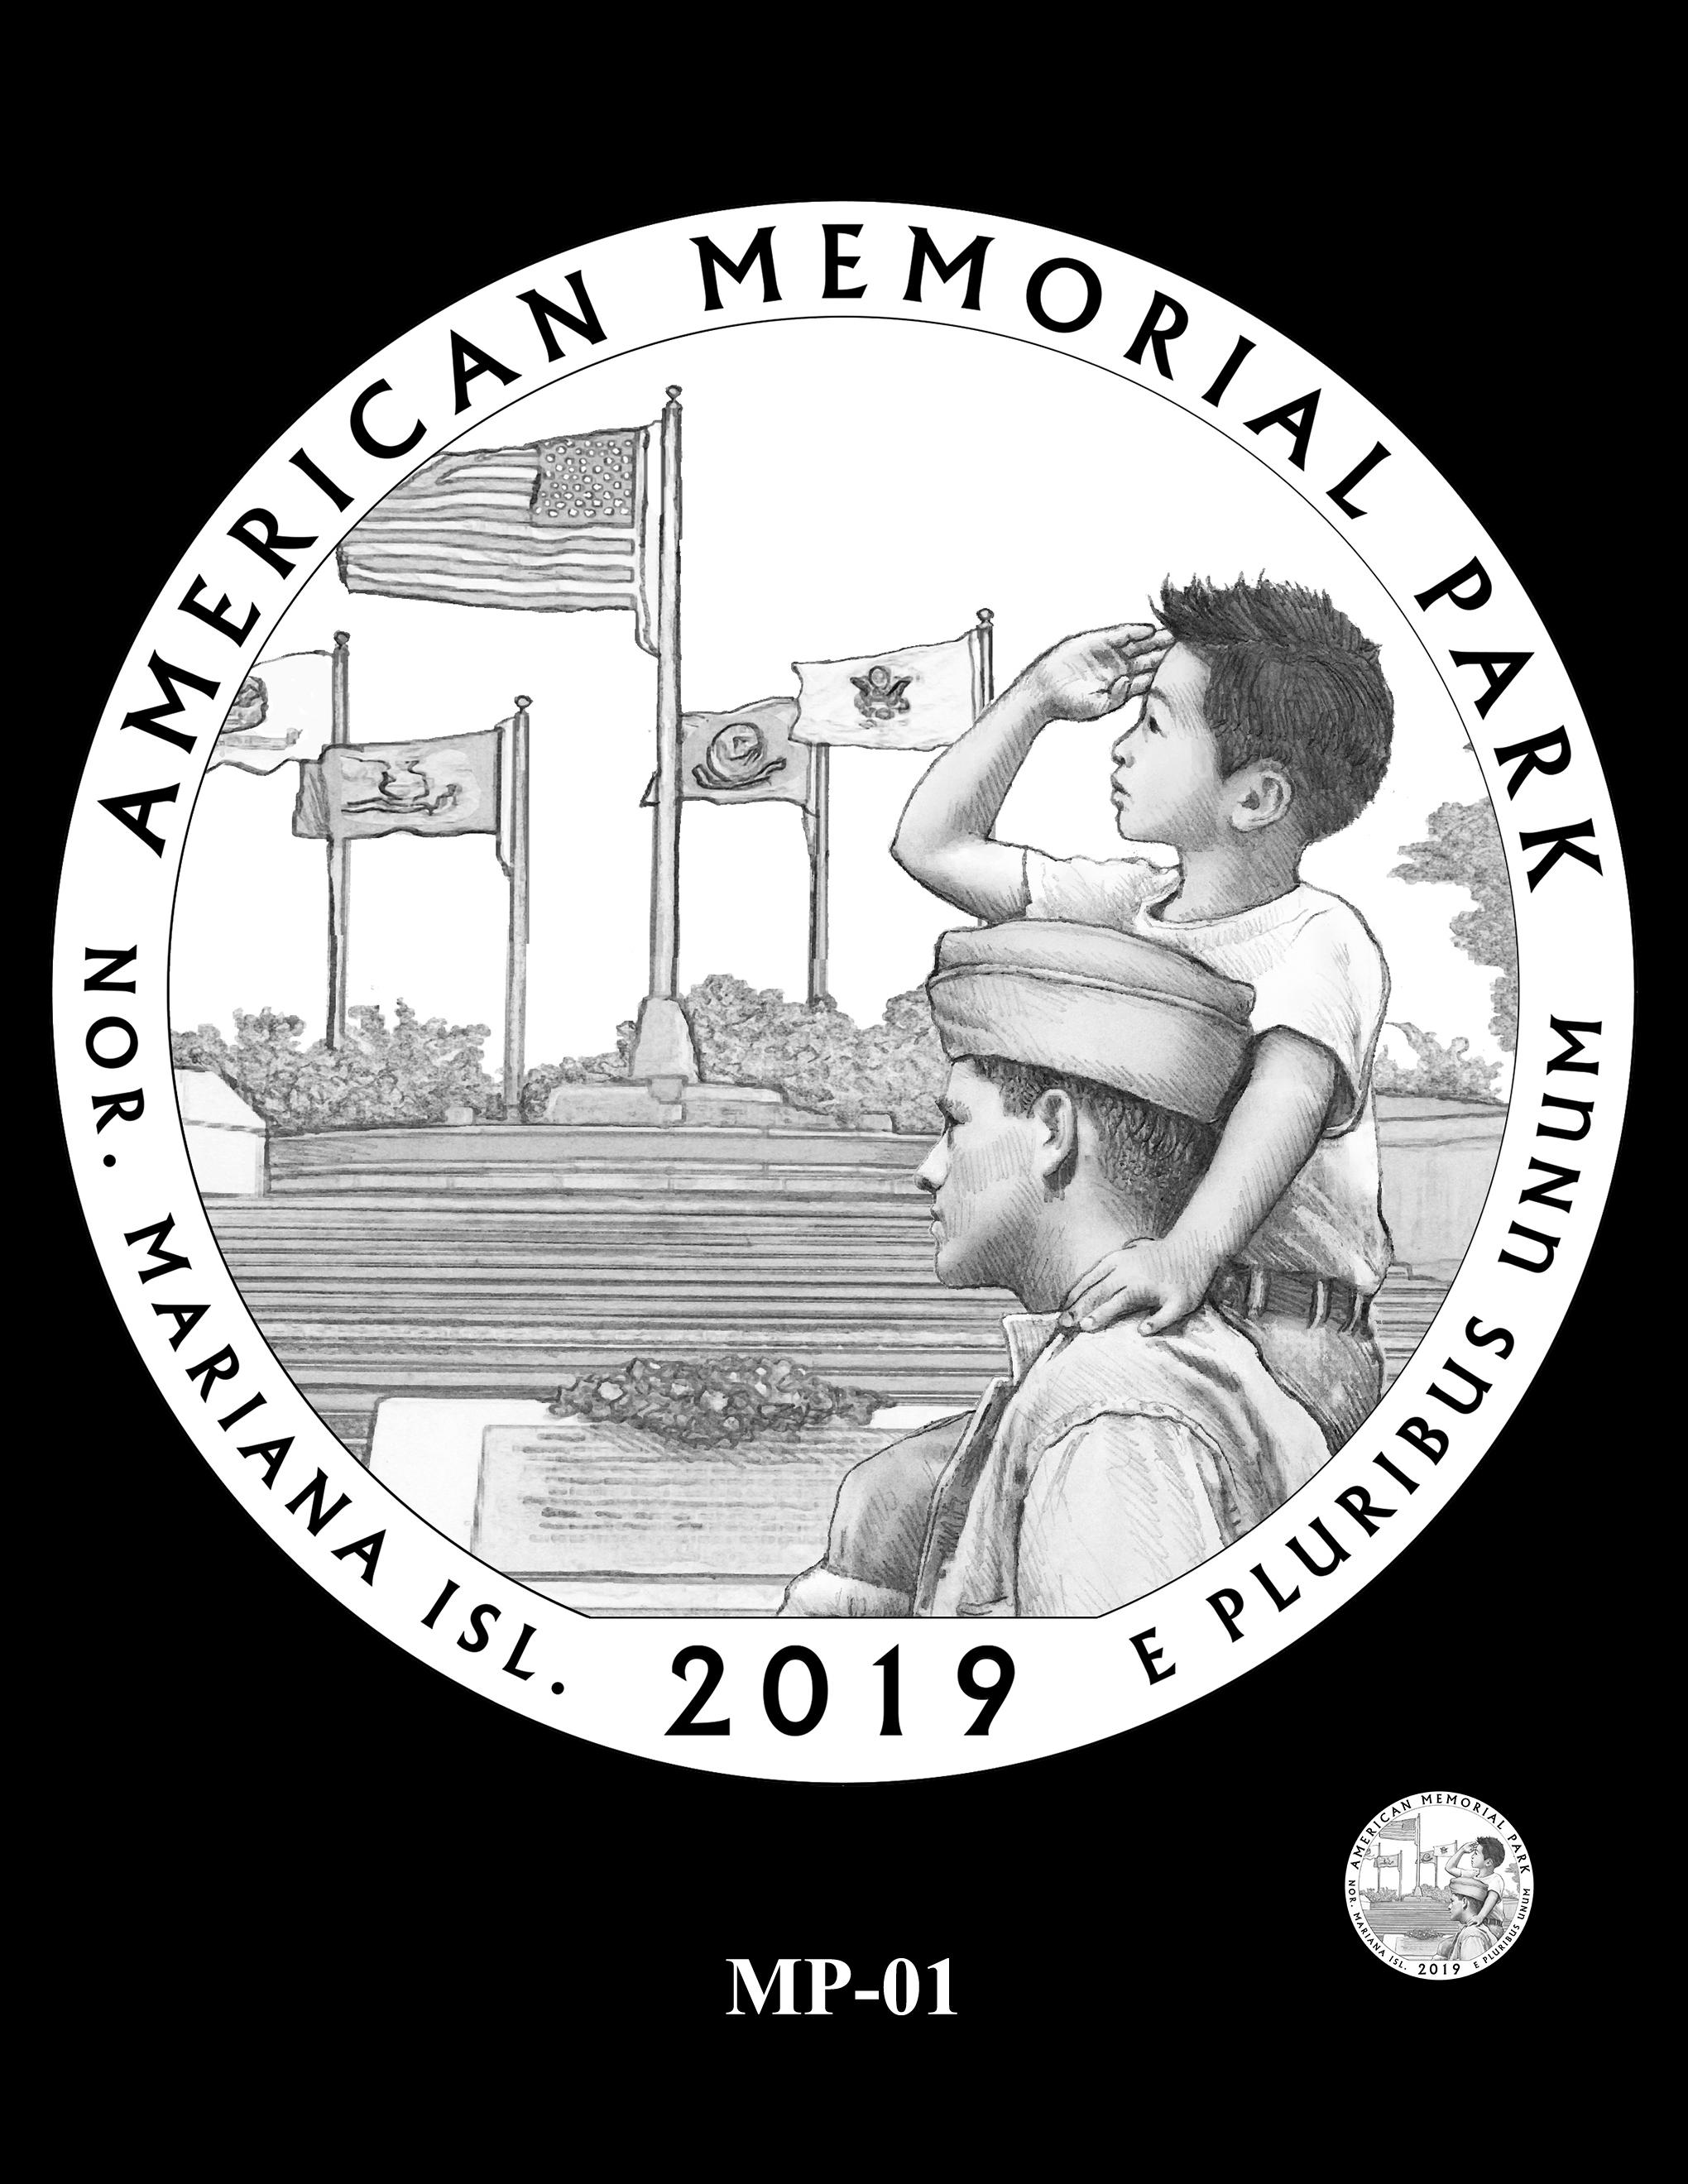 MP-01 -- 2019 America the Beautiful Quarters® Program